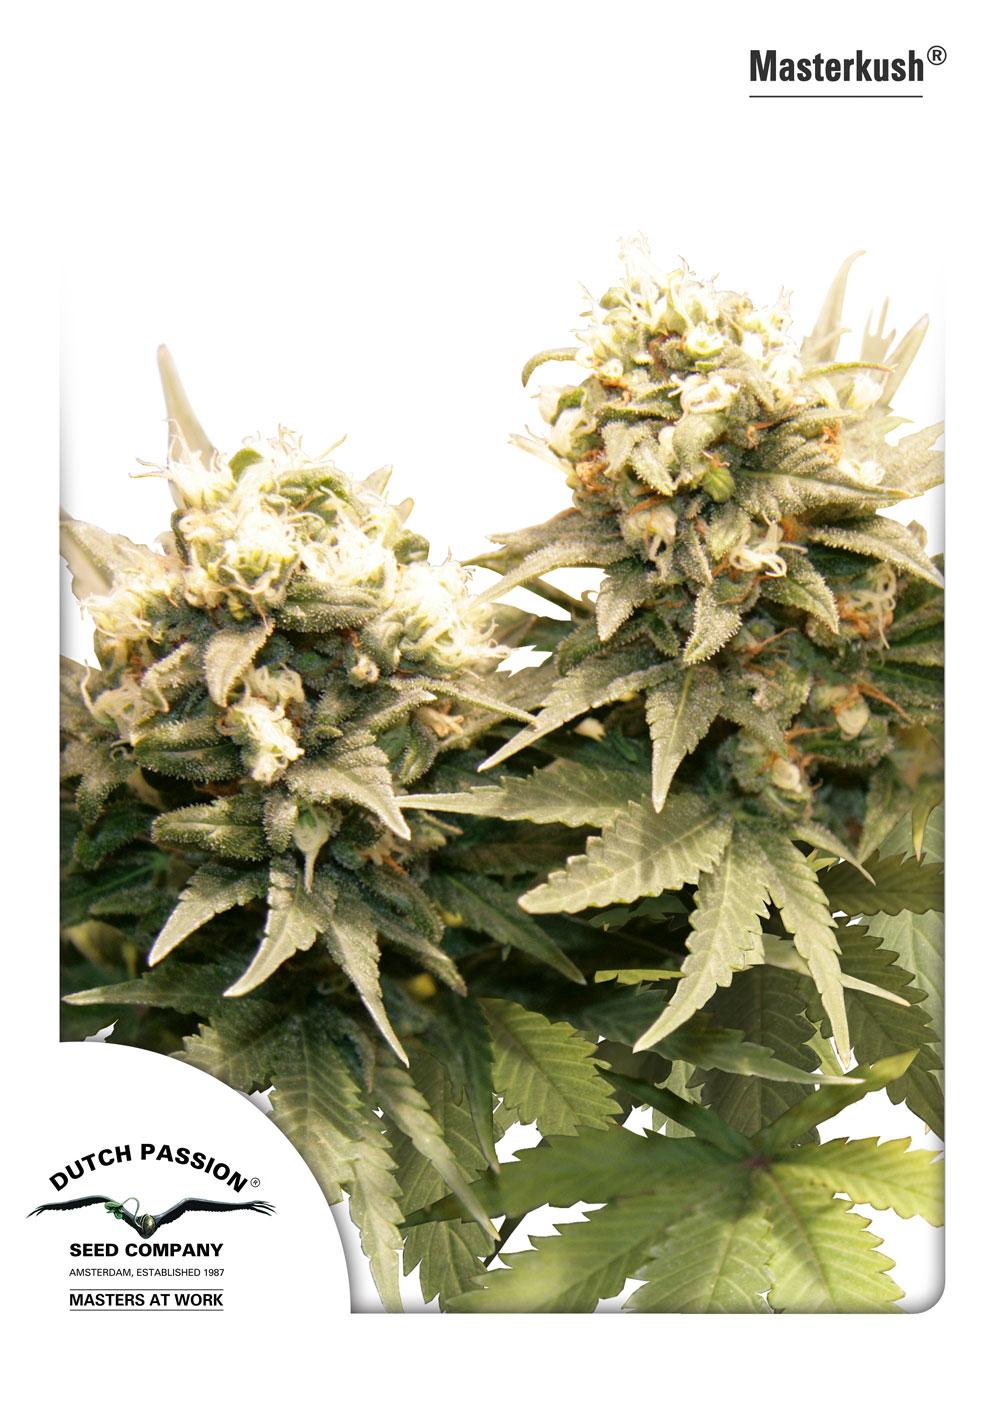 Masterkush graines de cannabis f minis es et r guli res for Graine de cannabis interieur